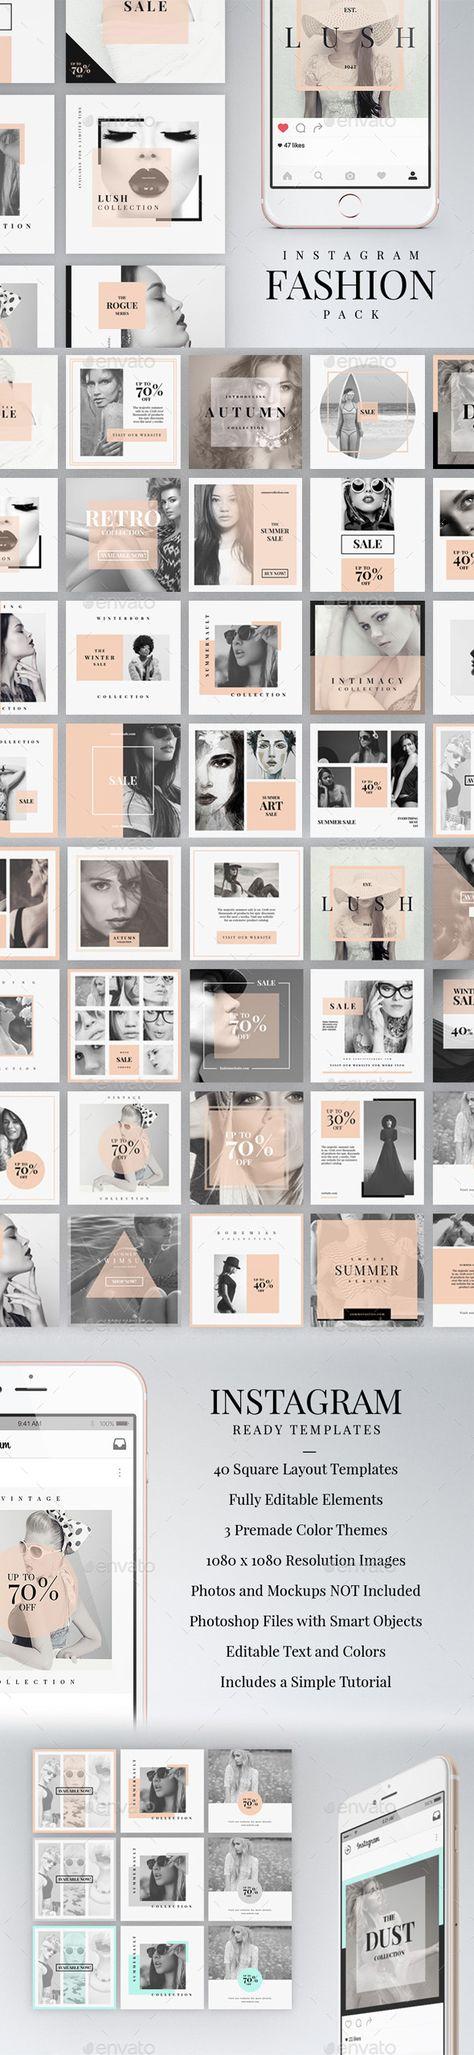 Instagram Fashion Pack — PSD Template #etsy #social media #presentation…